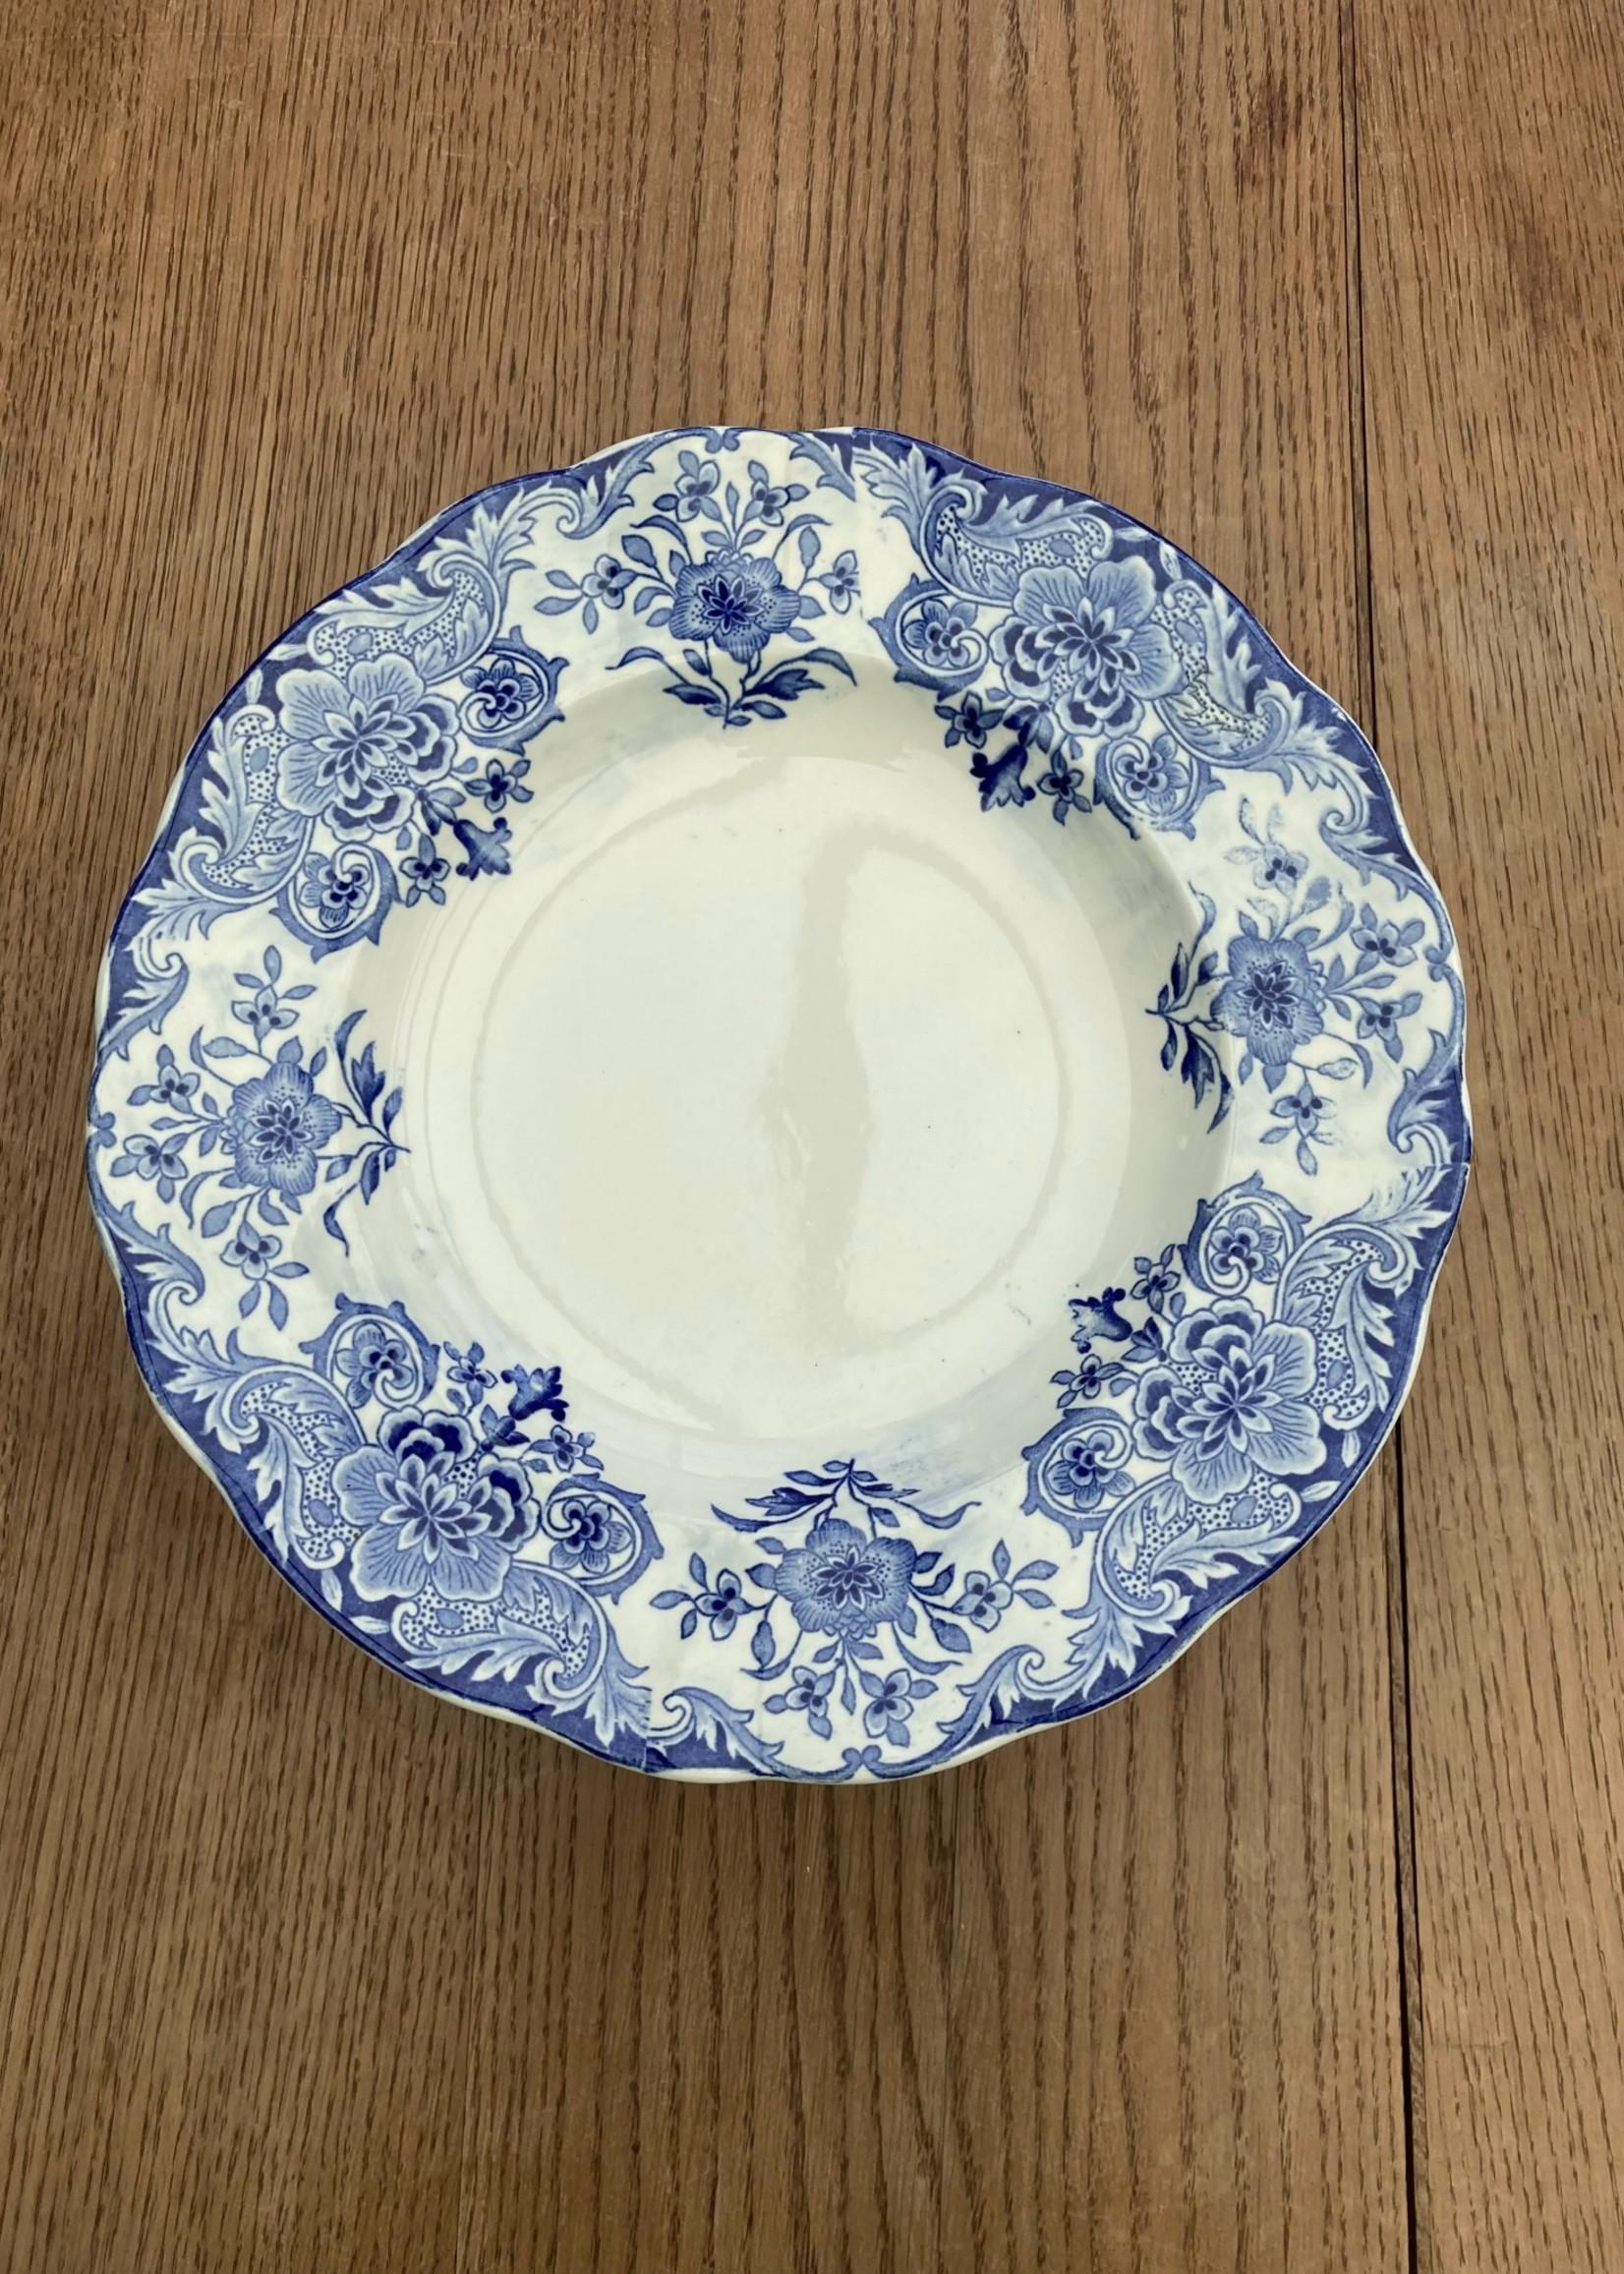 Small plates Dordrecht by Boch